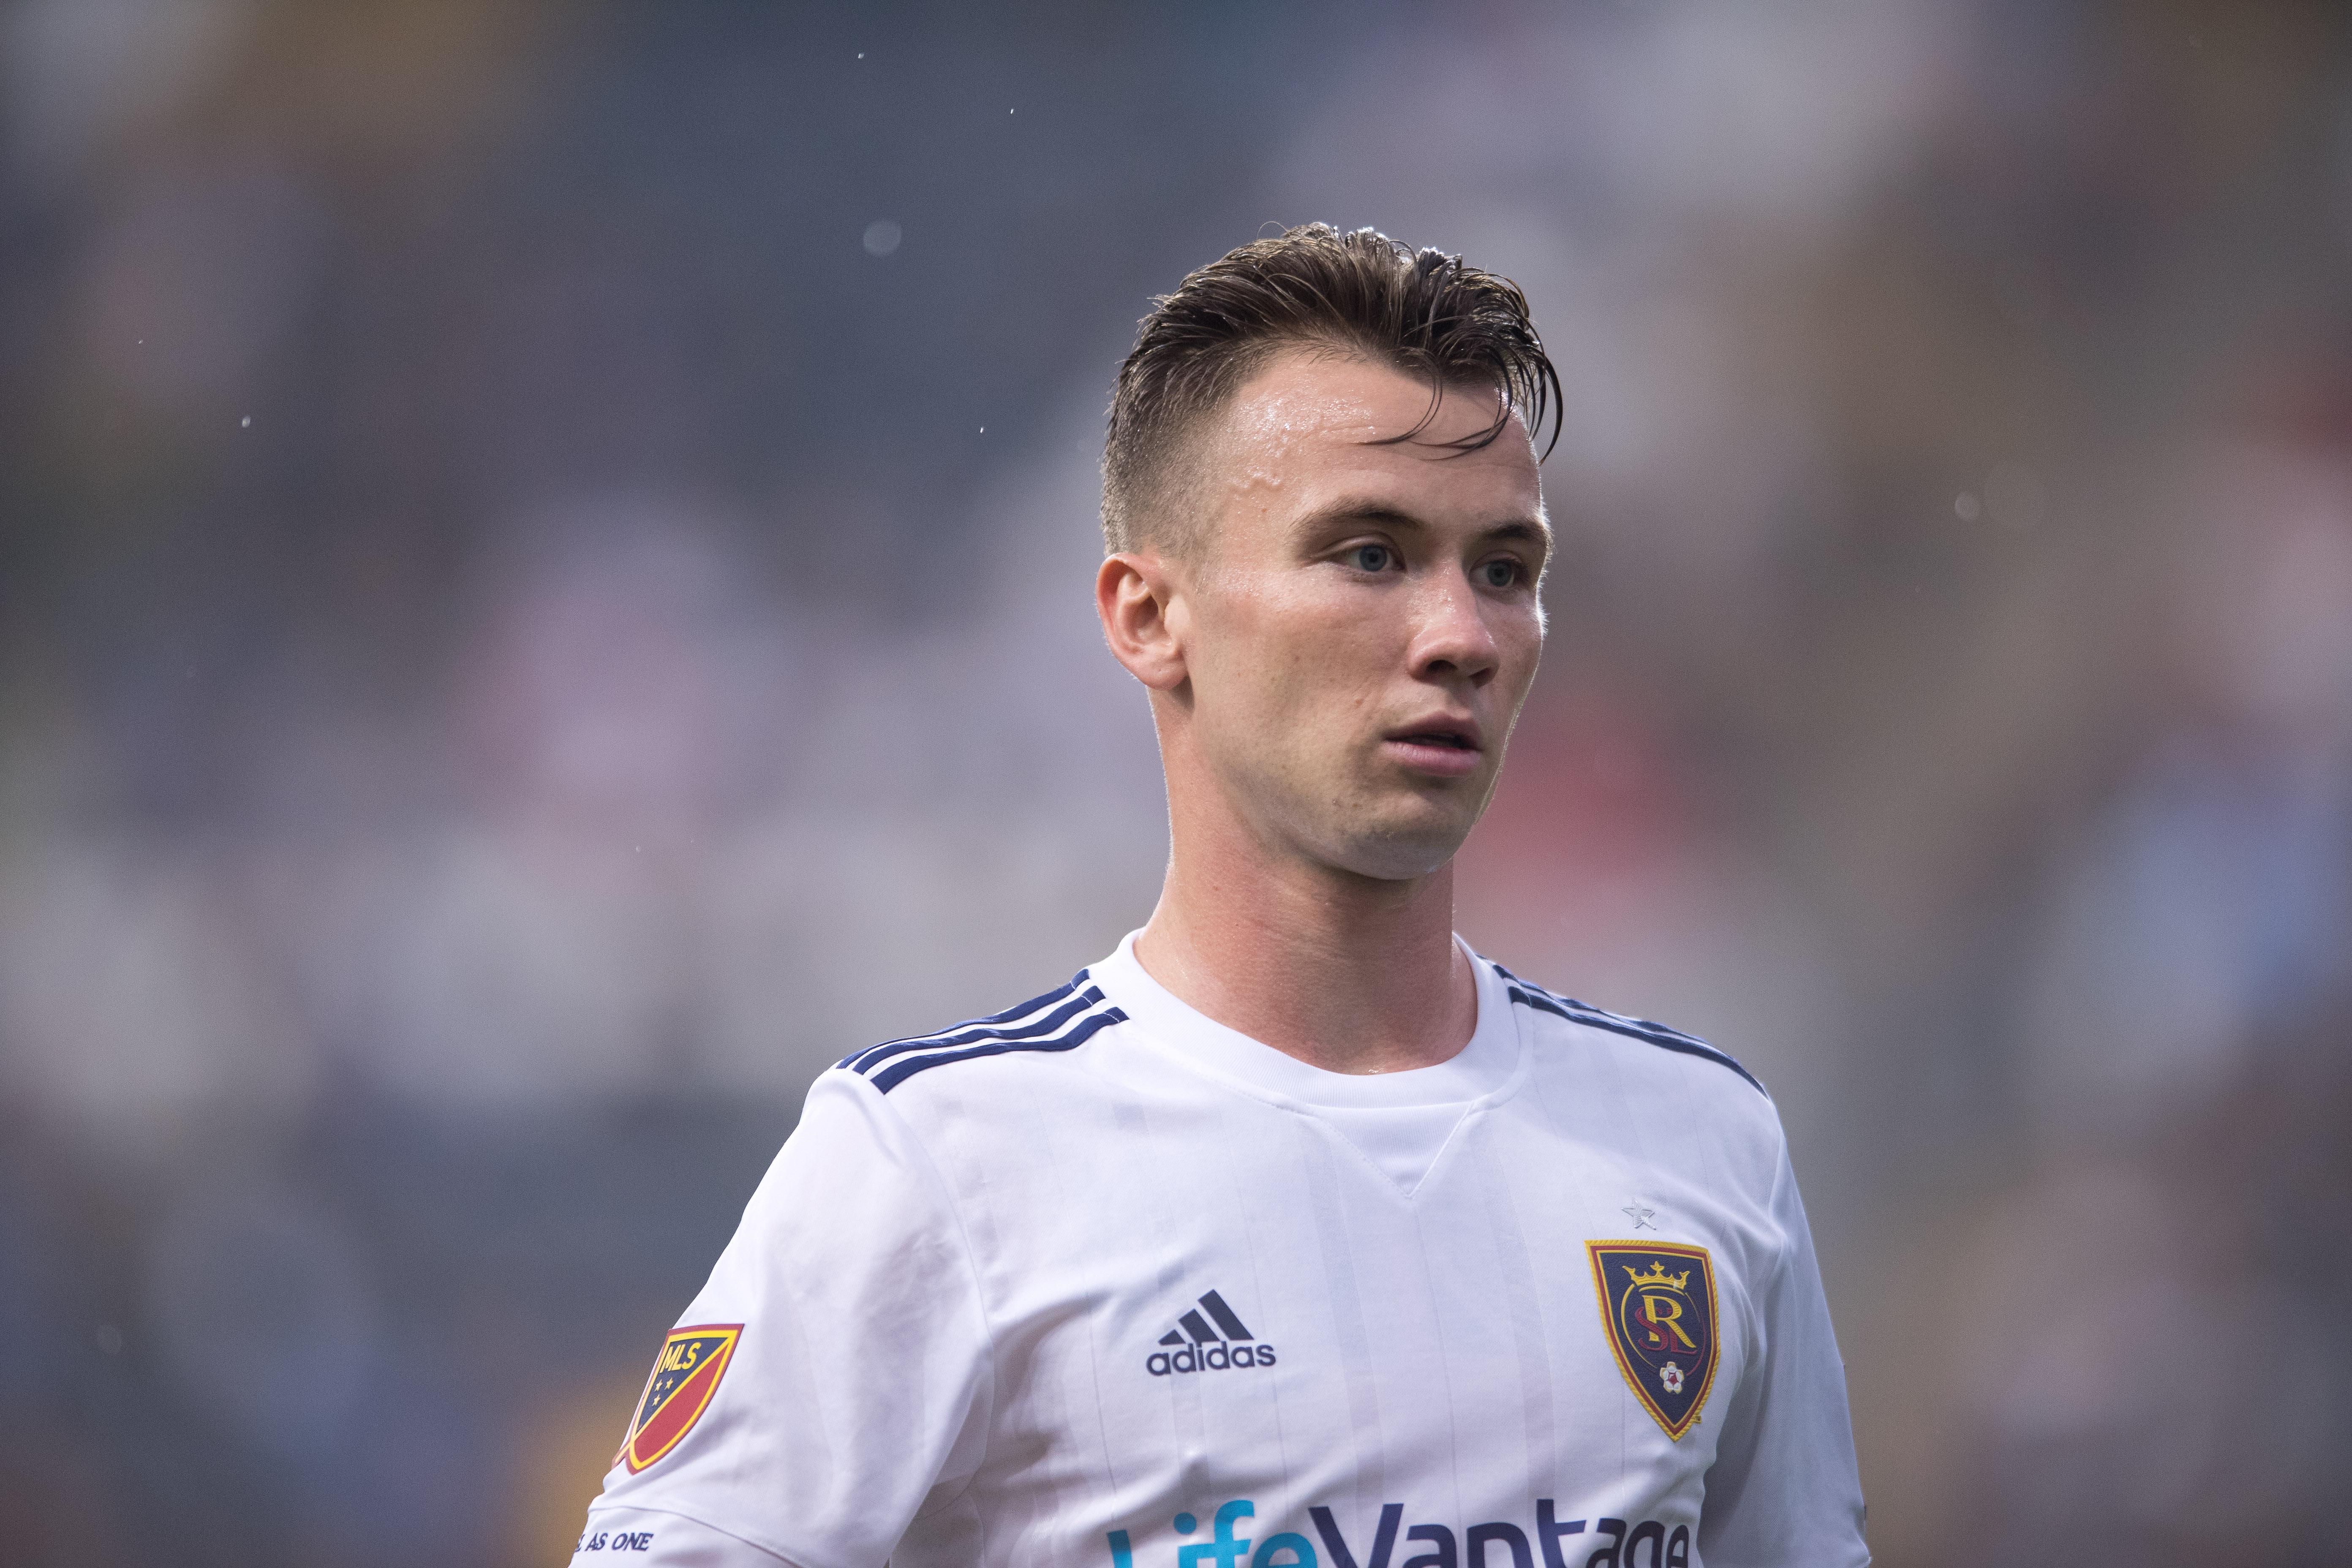 SOCCER: MAY 19 MLS - Real Salt Lake at Philadelphia Union